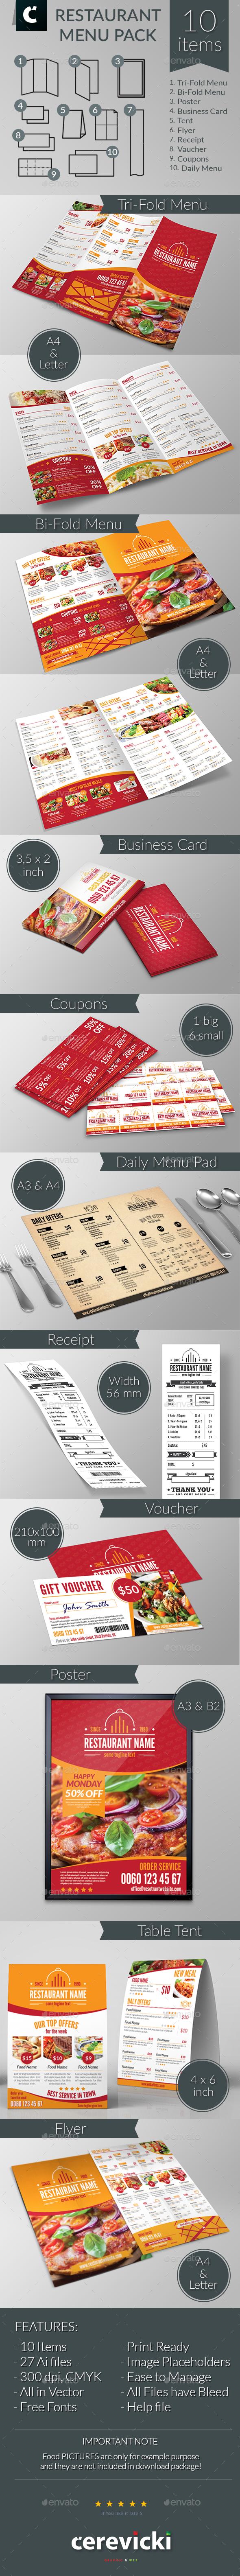 Restaurant Food Menu Pack - Restaurant Flyers